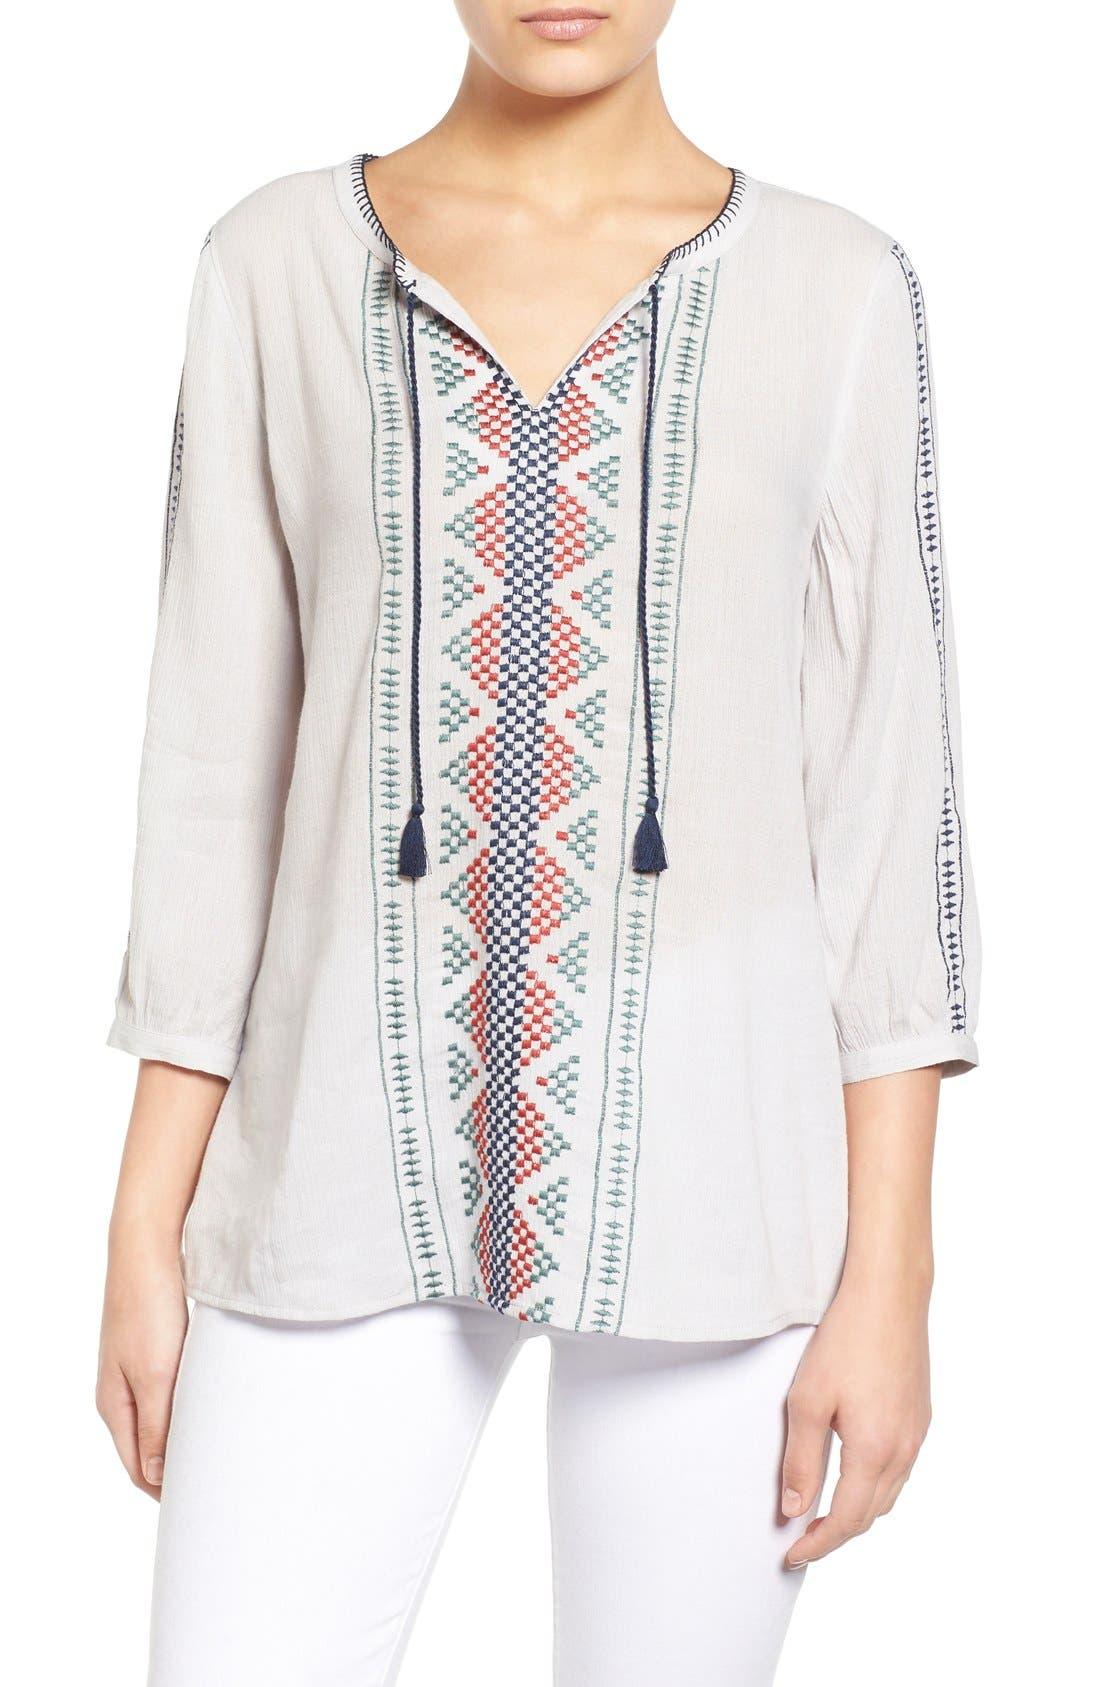 Alternate Image 1 Selected - Caslon® Embroidered Boho Blouse (Regular & Petite)